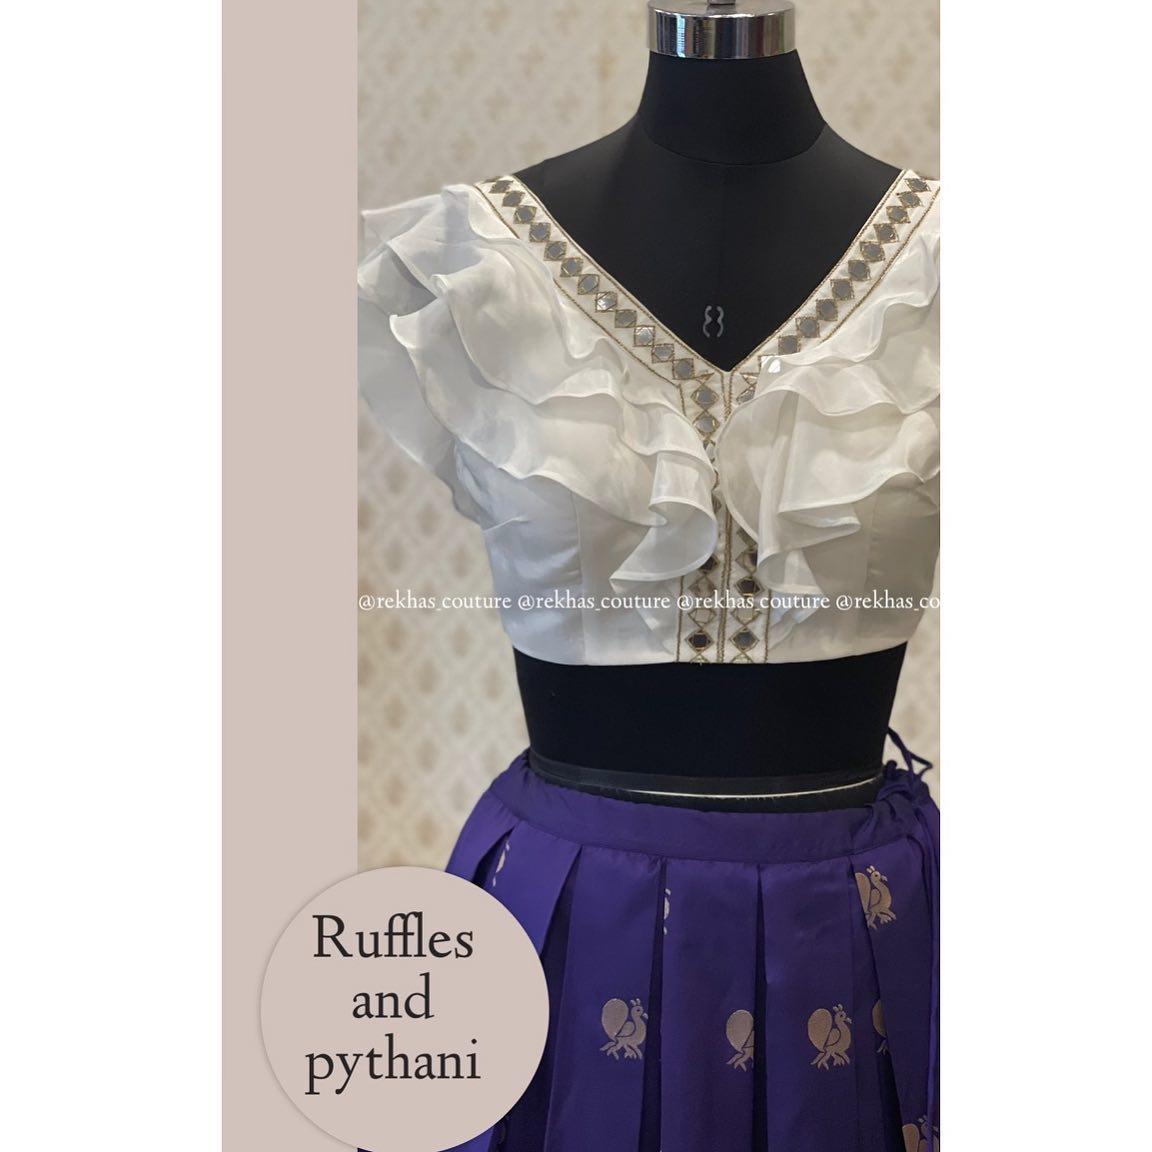 Pythani look lehenga with ruffle pattern mirror work blouse. 2021-07-18